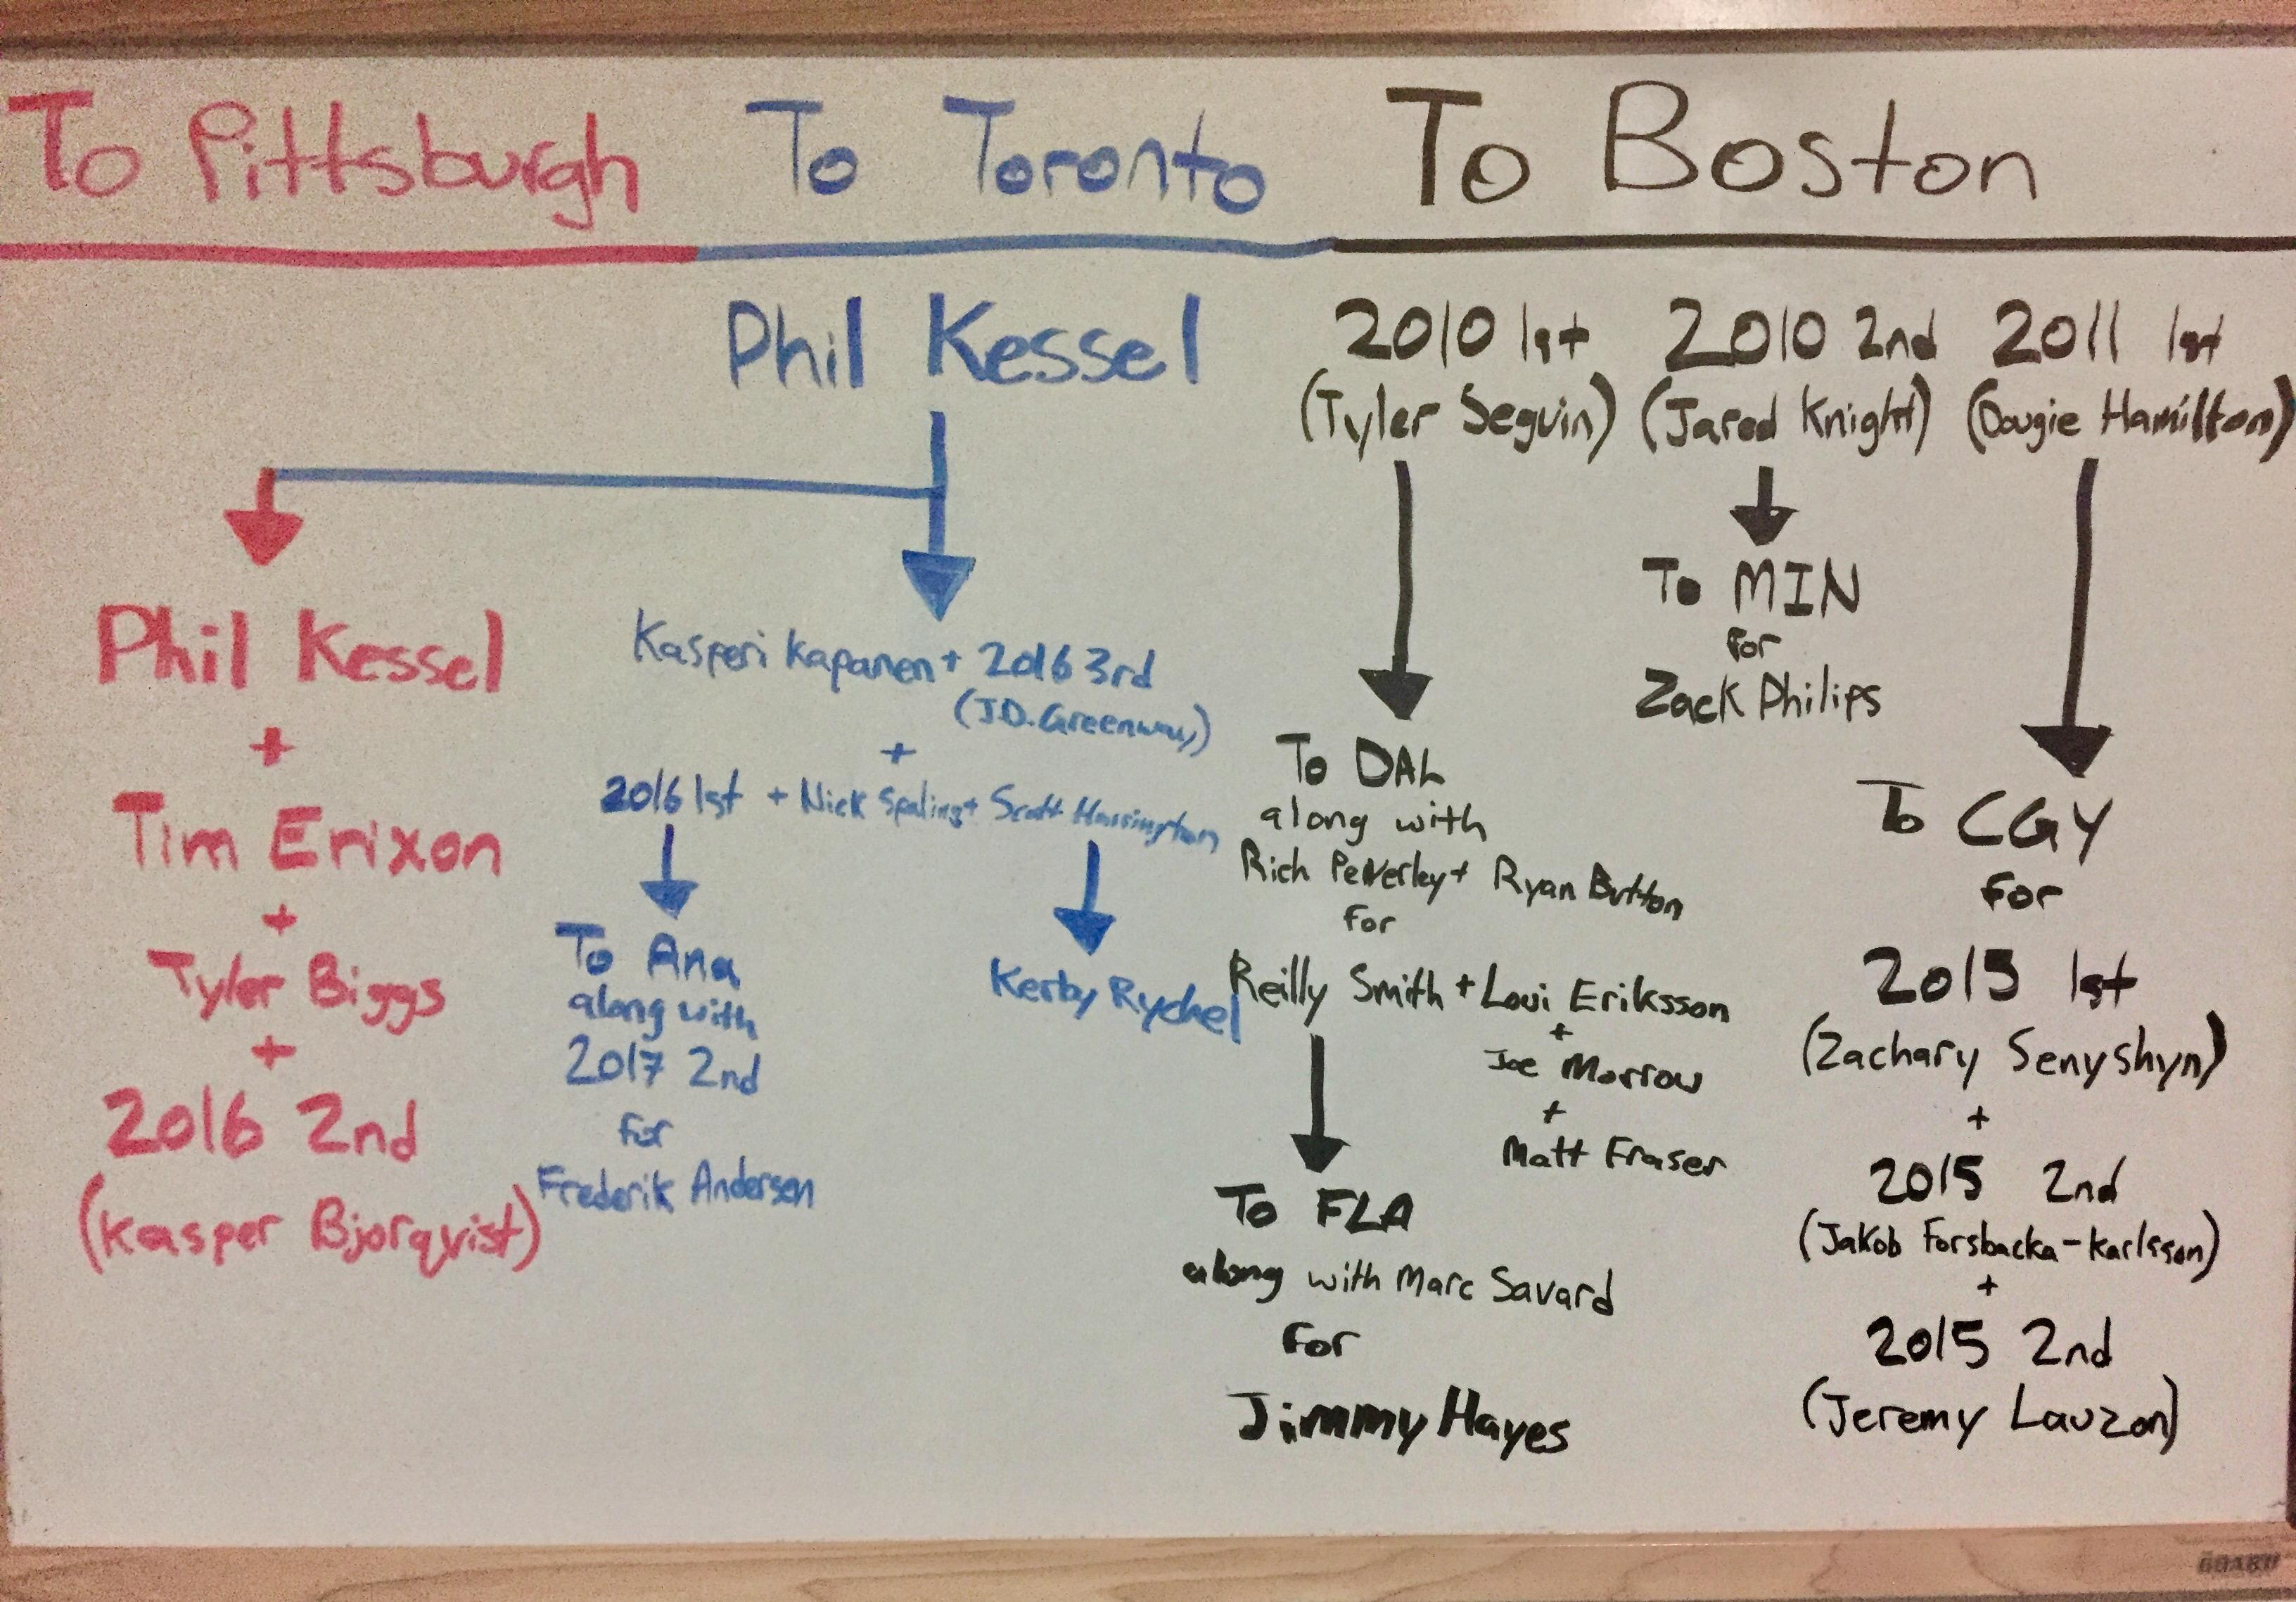 Toronto Maple Leafs Trade Tree: Phil Kessel - Sportsnet.ca